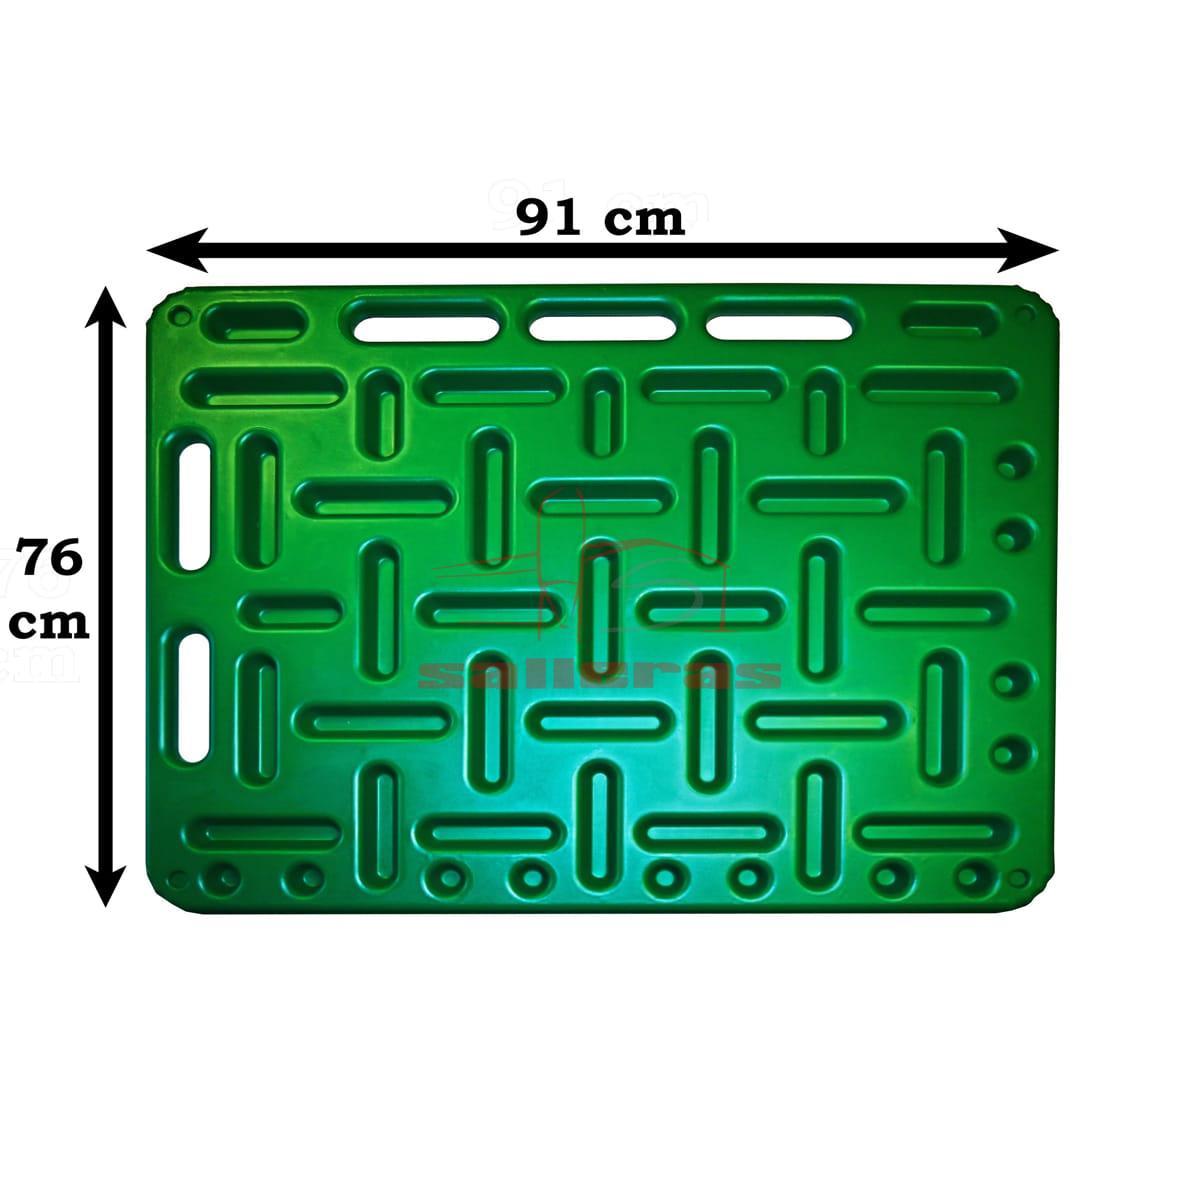 Dos paneles verdes para empujar ganado